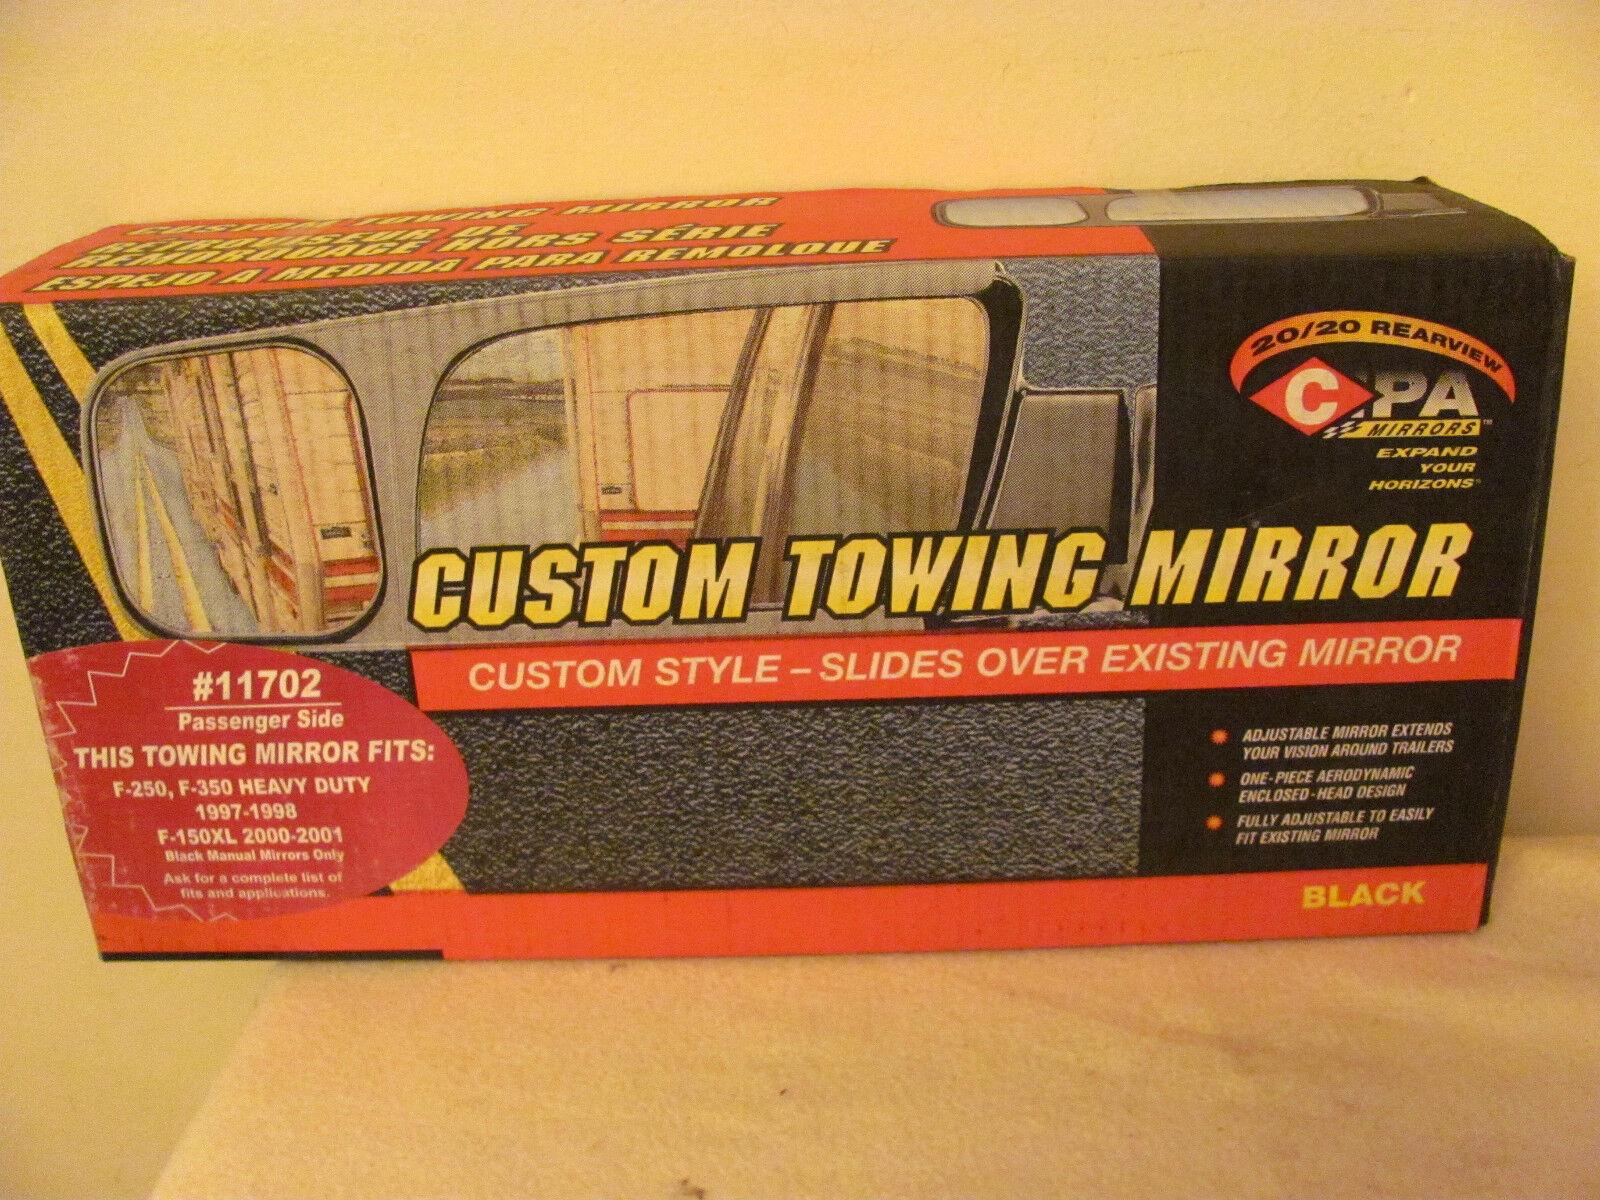 CIPA11702 Custom Towing Mirror Ford 1997-1998 Pickup 250 350 RH+00 01 F150XL